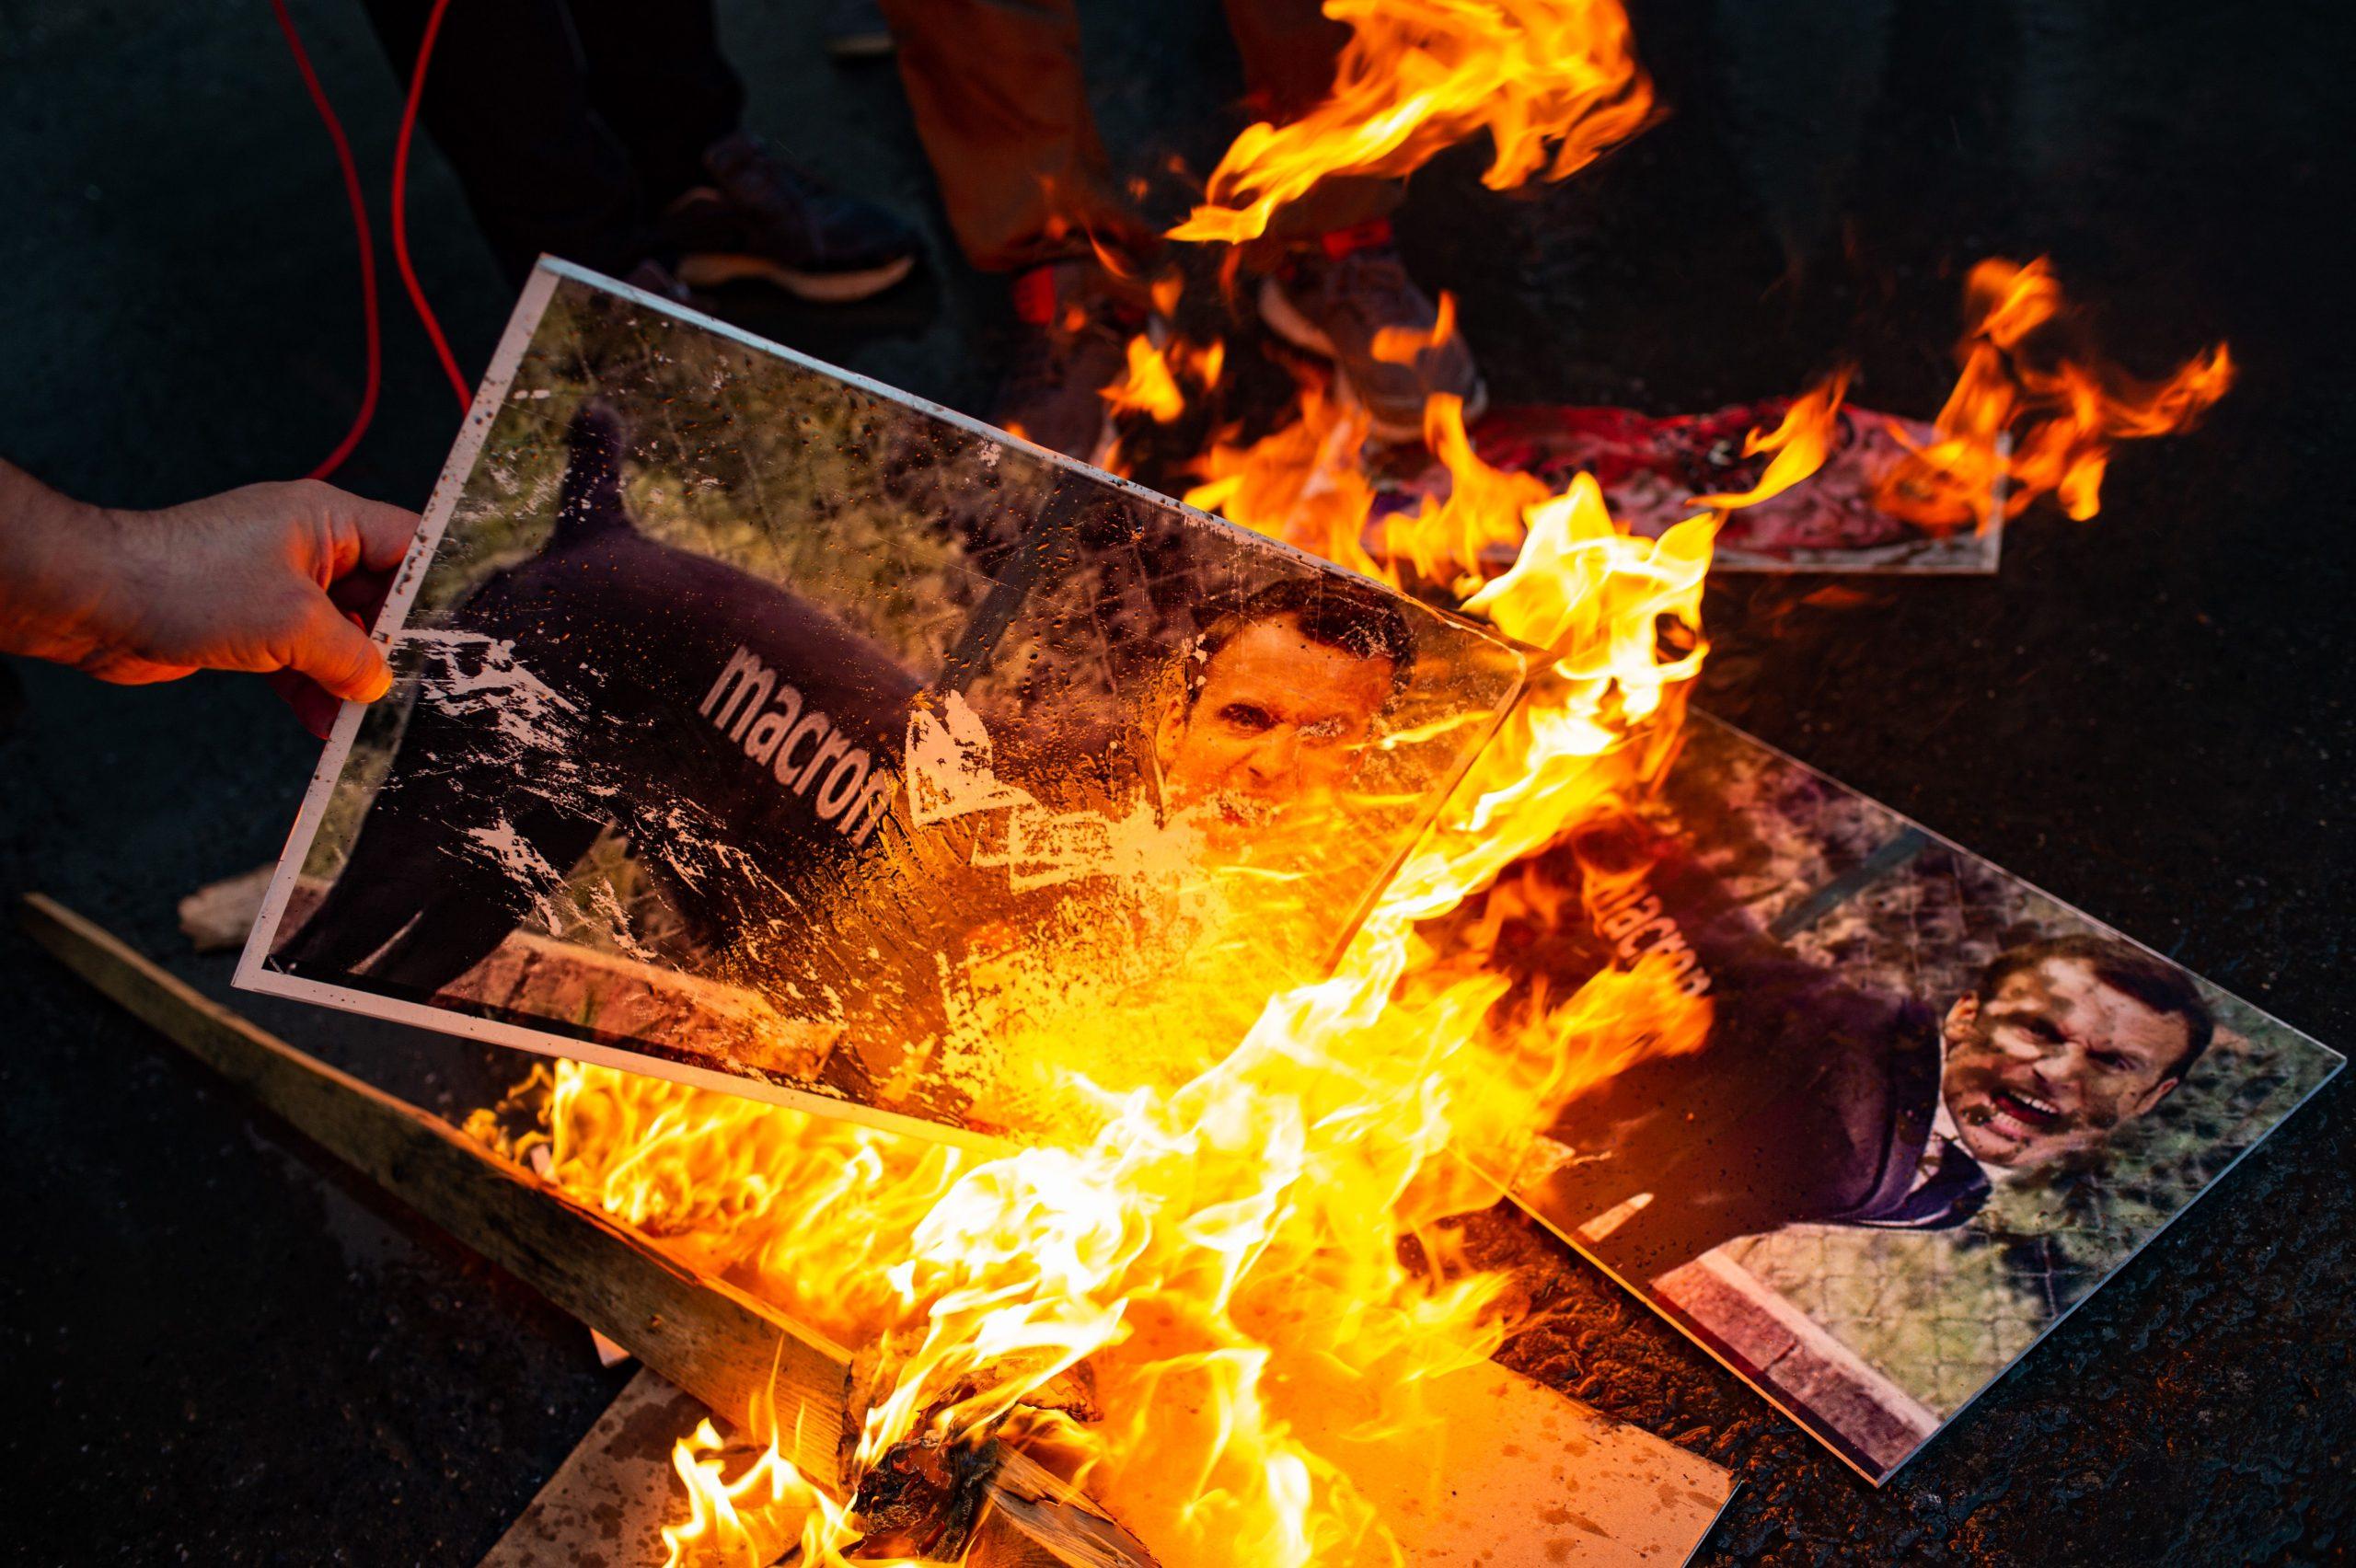 """Wir sind alle Soldaten des Propheten Mohammed"": Muslime protestieren gegen Frankreichs Staatschef Macron"